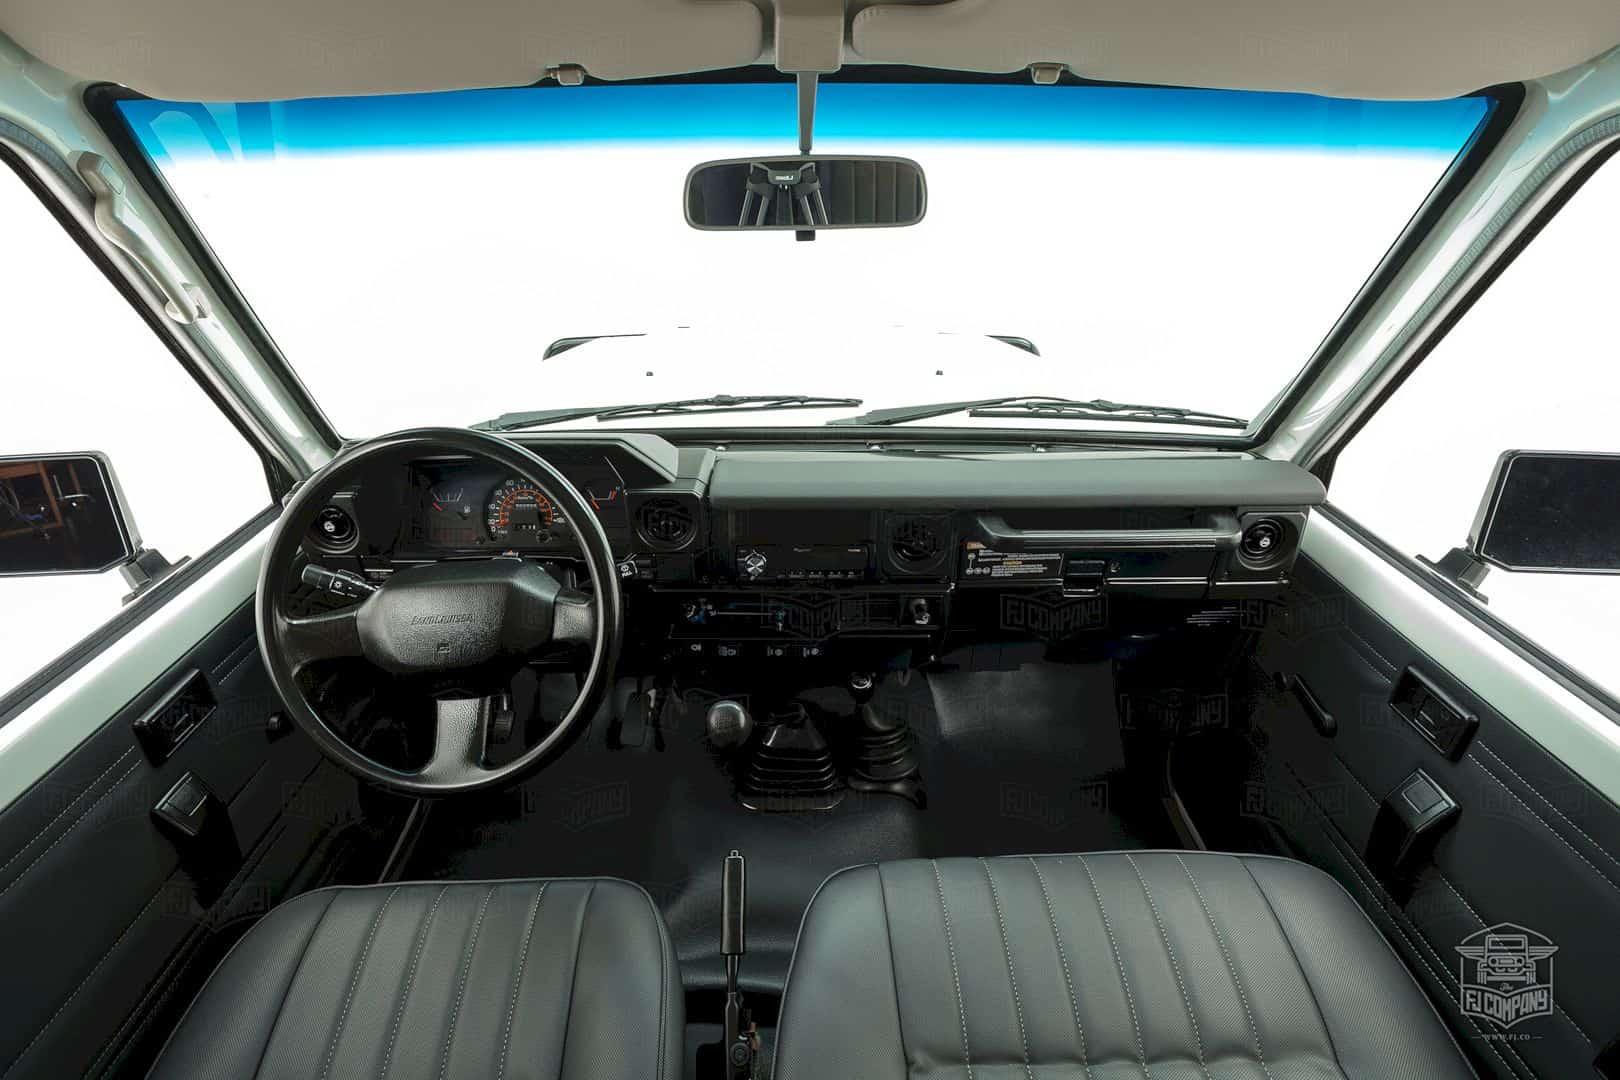 1992 Toyota Land Cruiser Hzj75 2